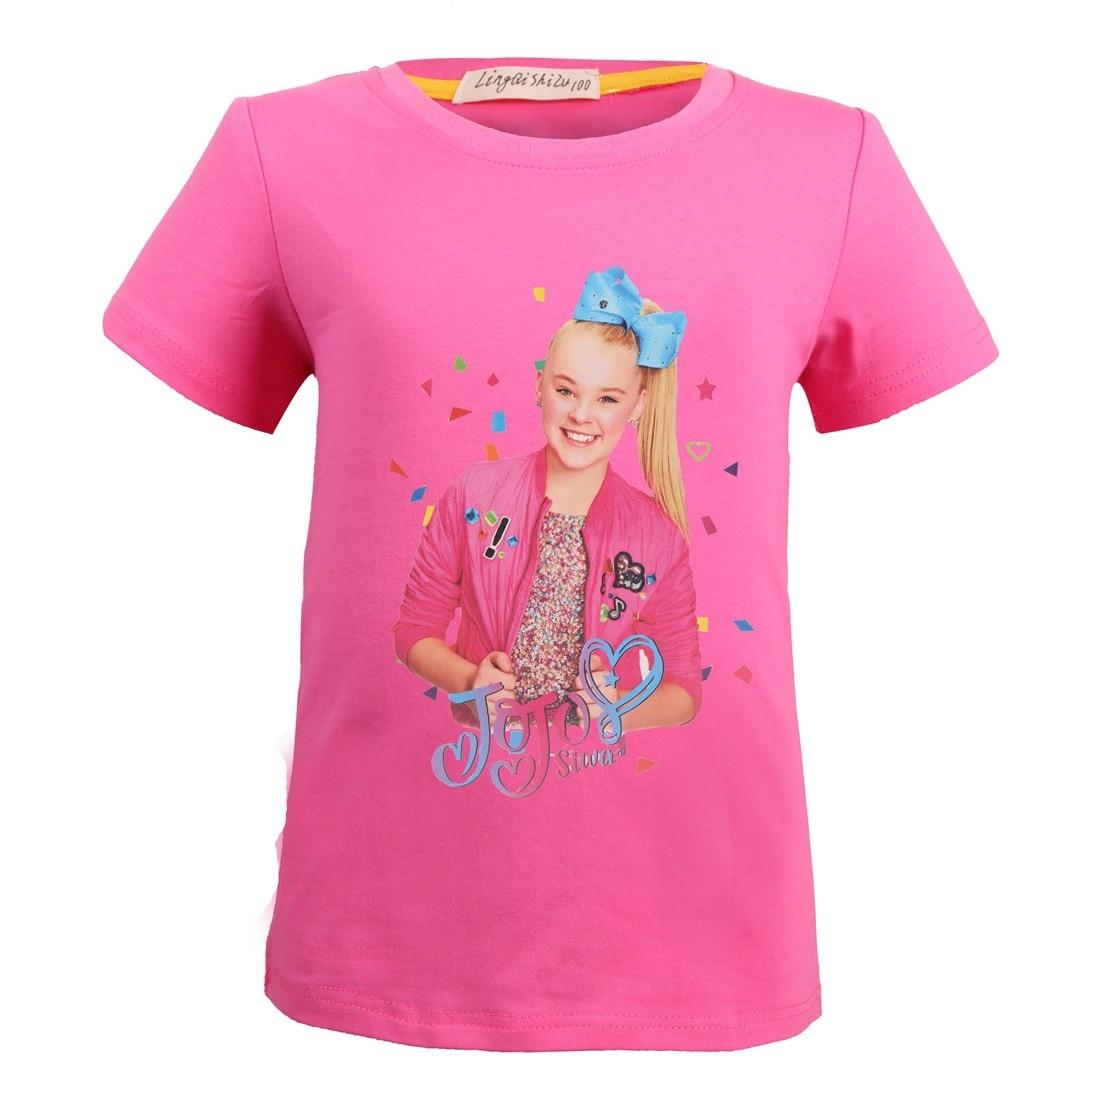 7f9fa77162c81 2019 New Children Summer my little girls Clothes jojo siwa Clothing ...